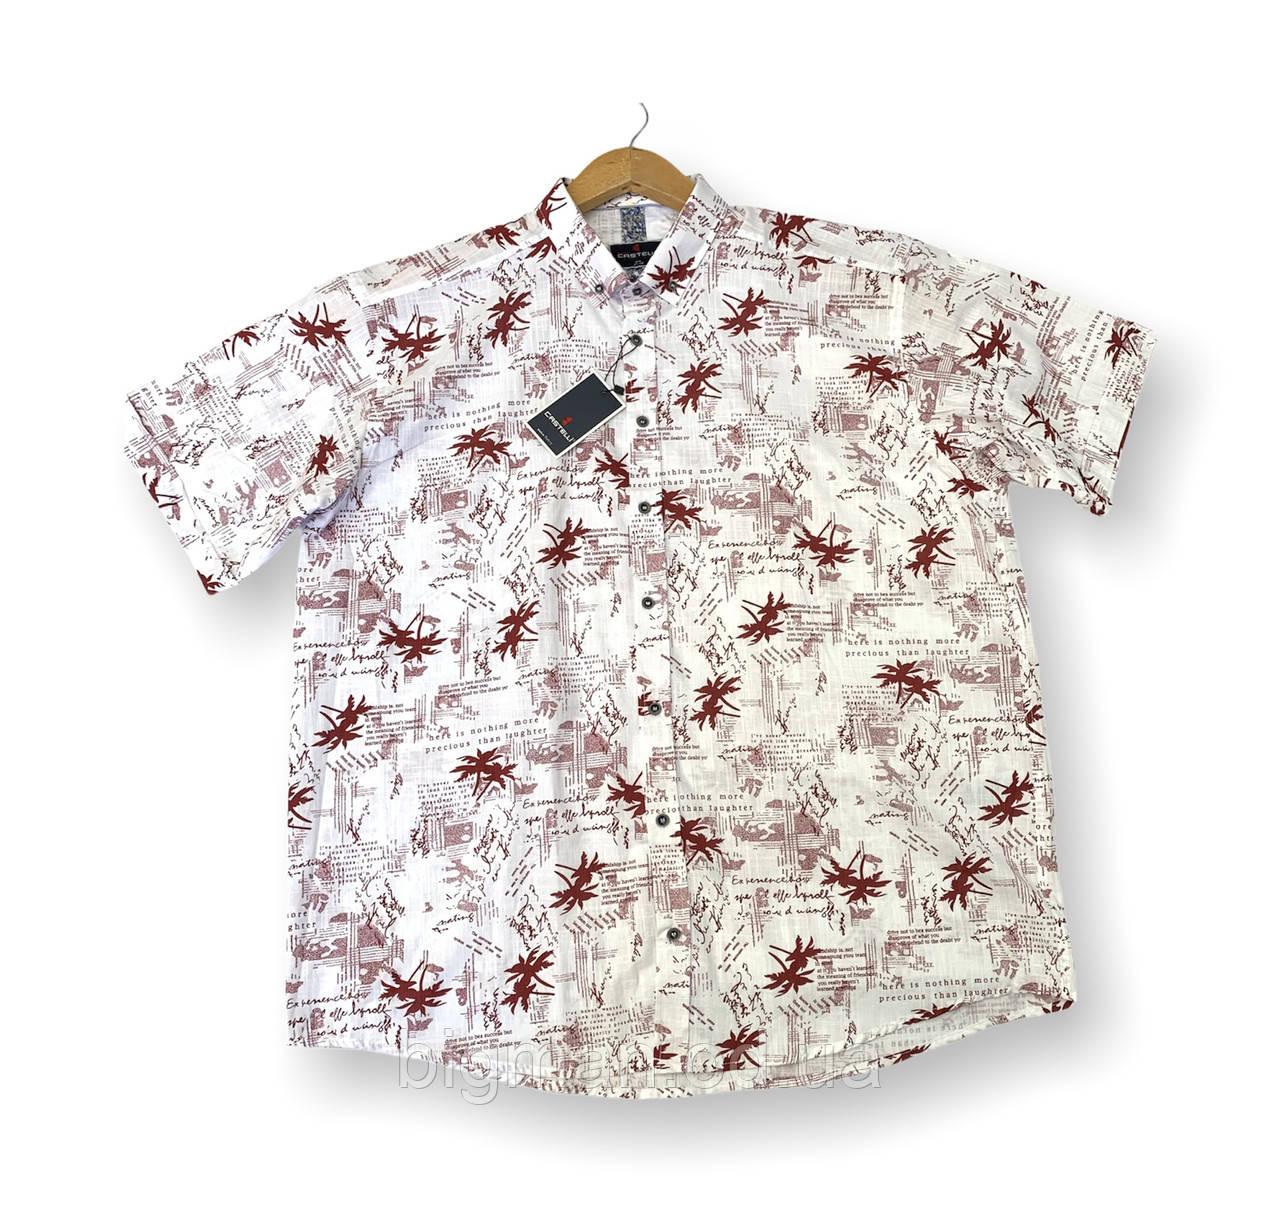 Мужская рубашка с коротким рукавом батальная белая льняная большие размеры (2XL 3XL 4XL) Турция Castelli